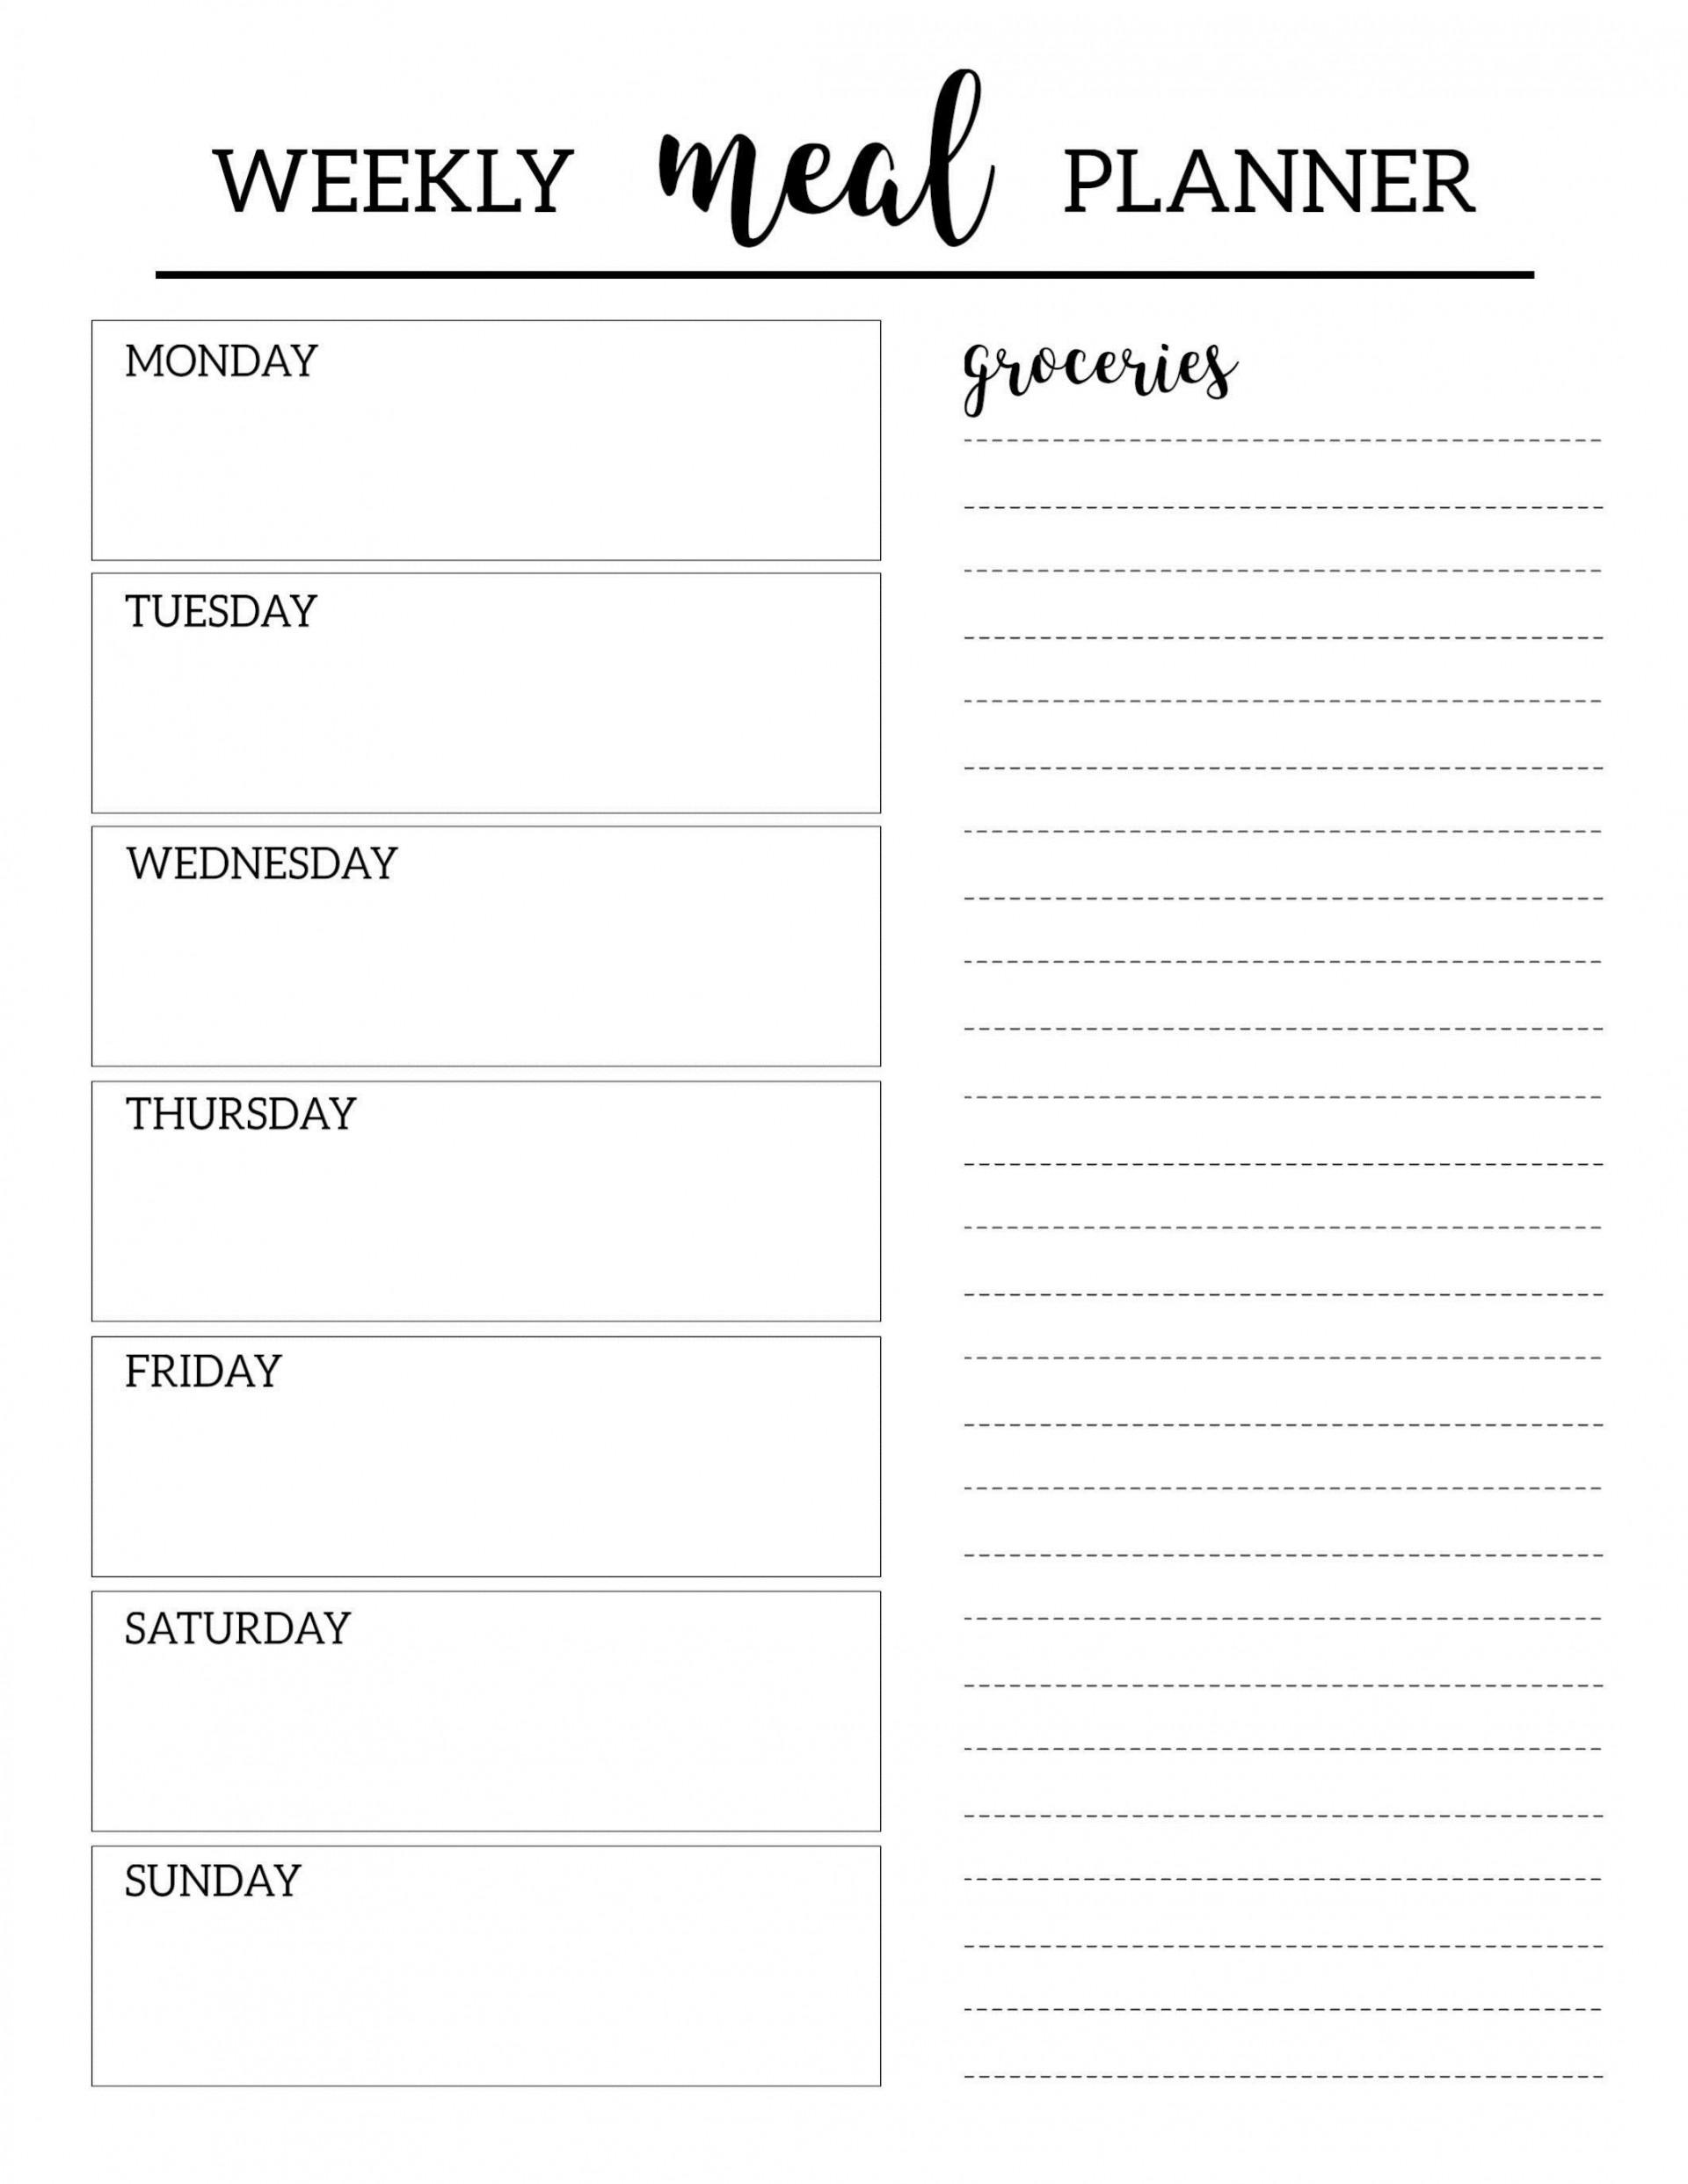 001 Impressive Free Printable Weekly Meal Plan Template Idea  Planning Worksheet1920